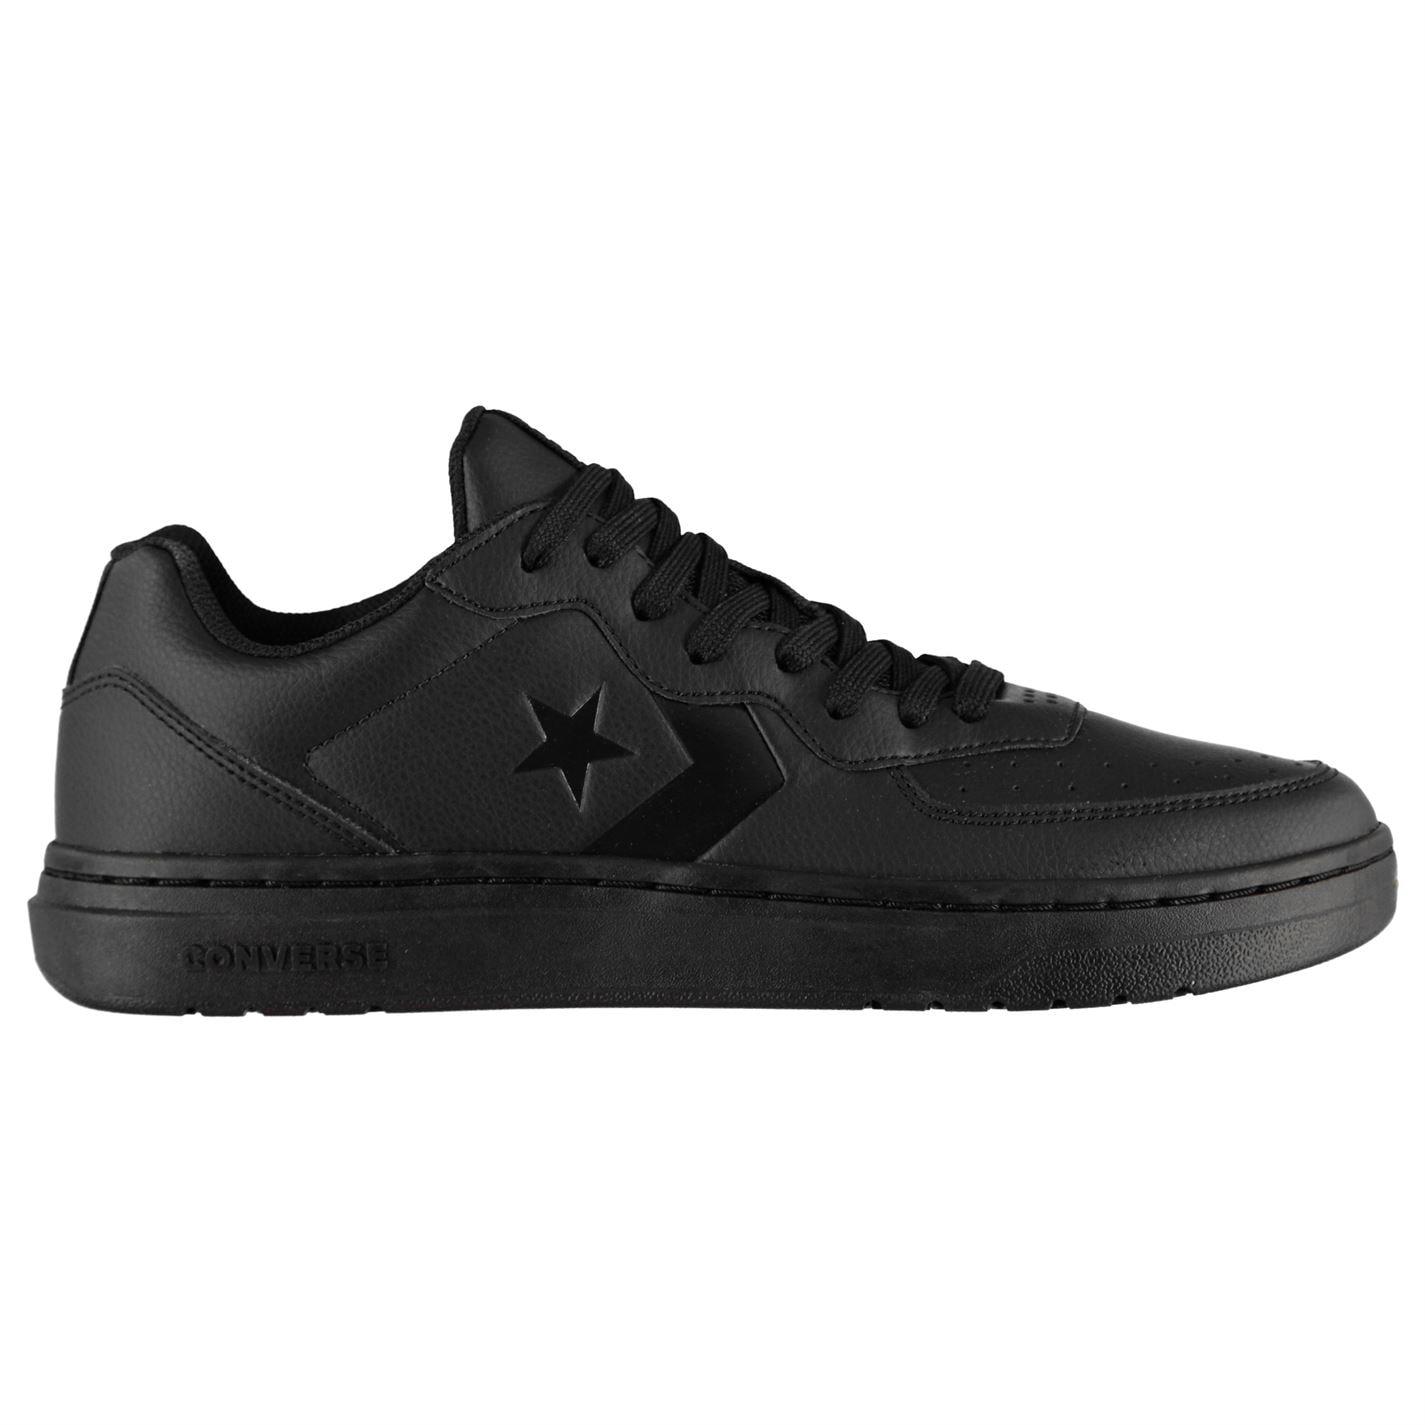 Converse Ox Rival Leather Trainers Pánské tenisky 11522103 9.5 (44)